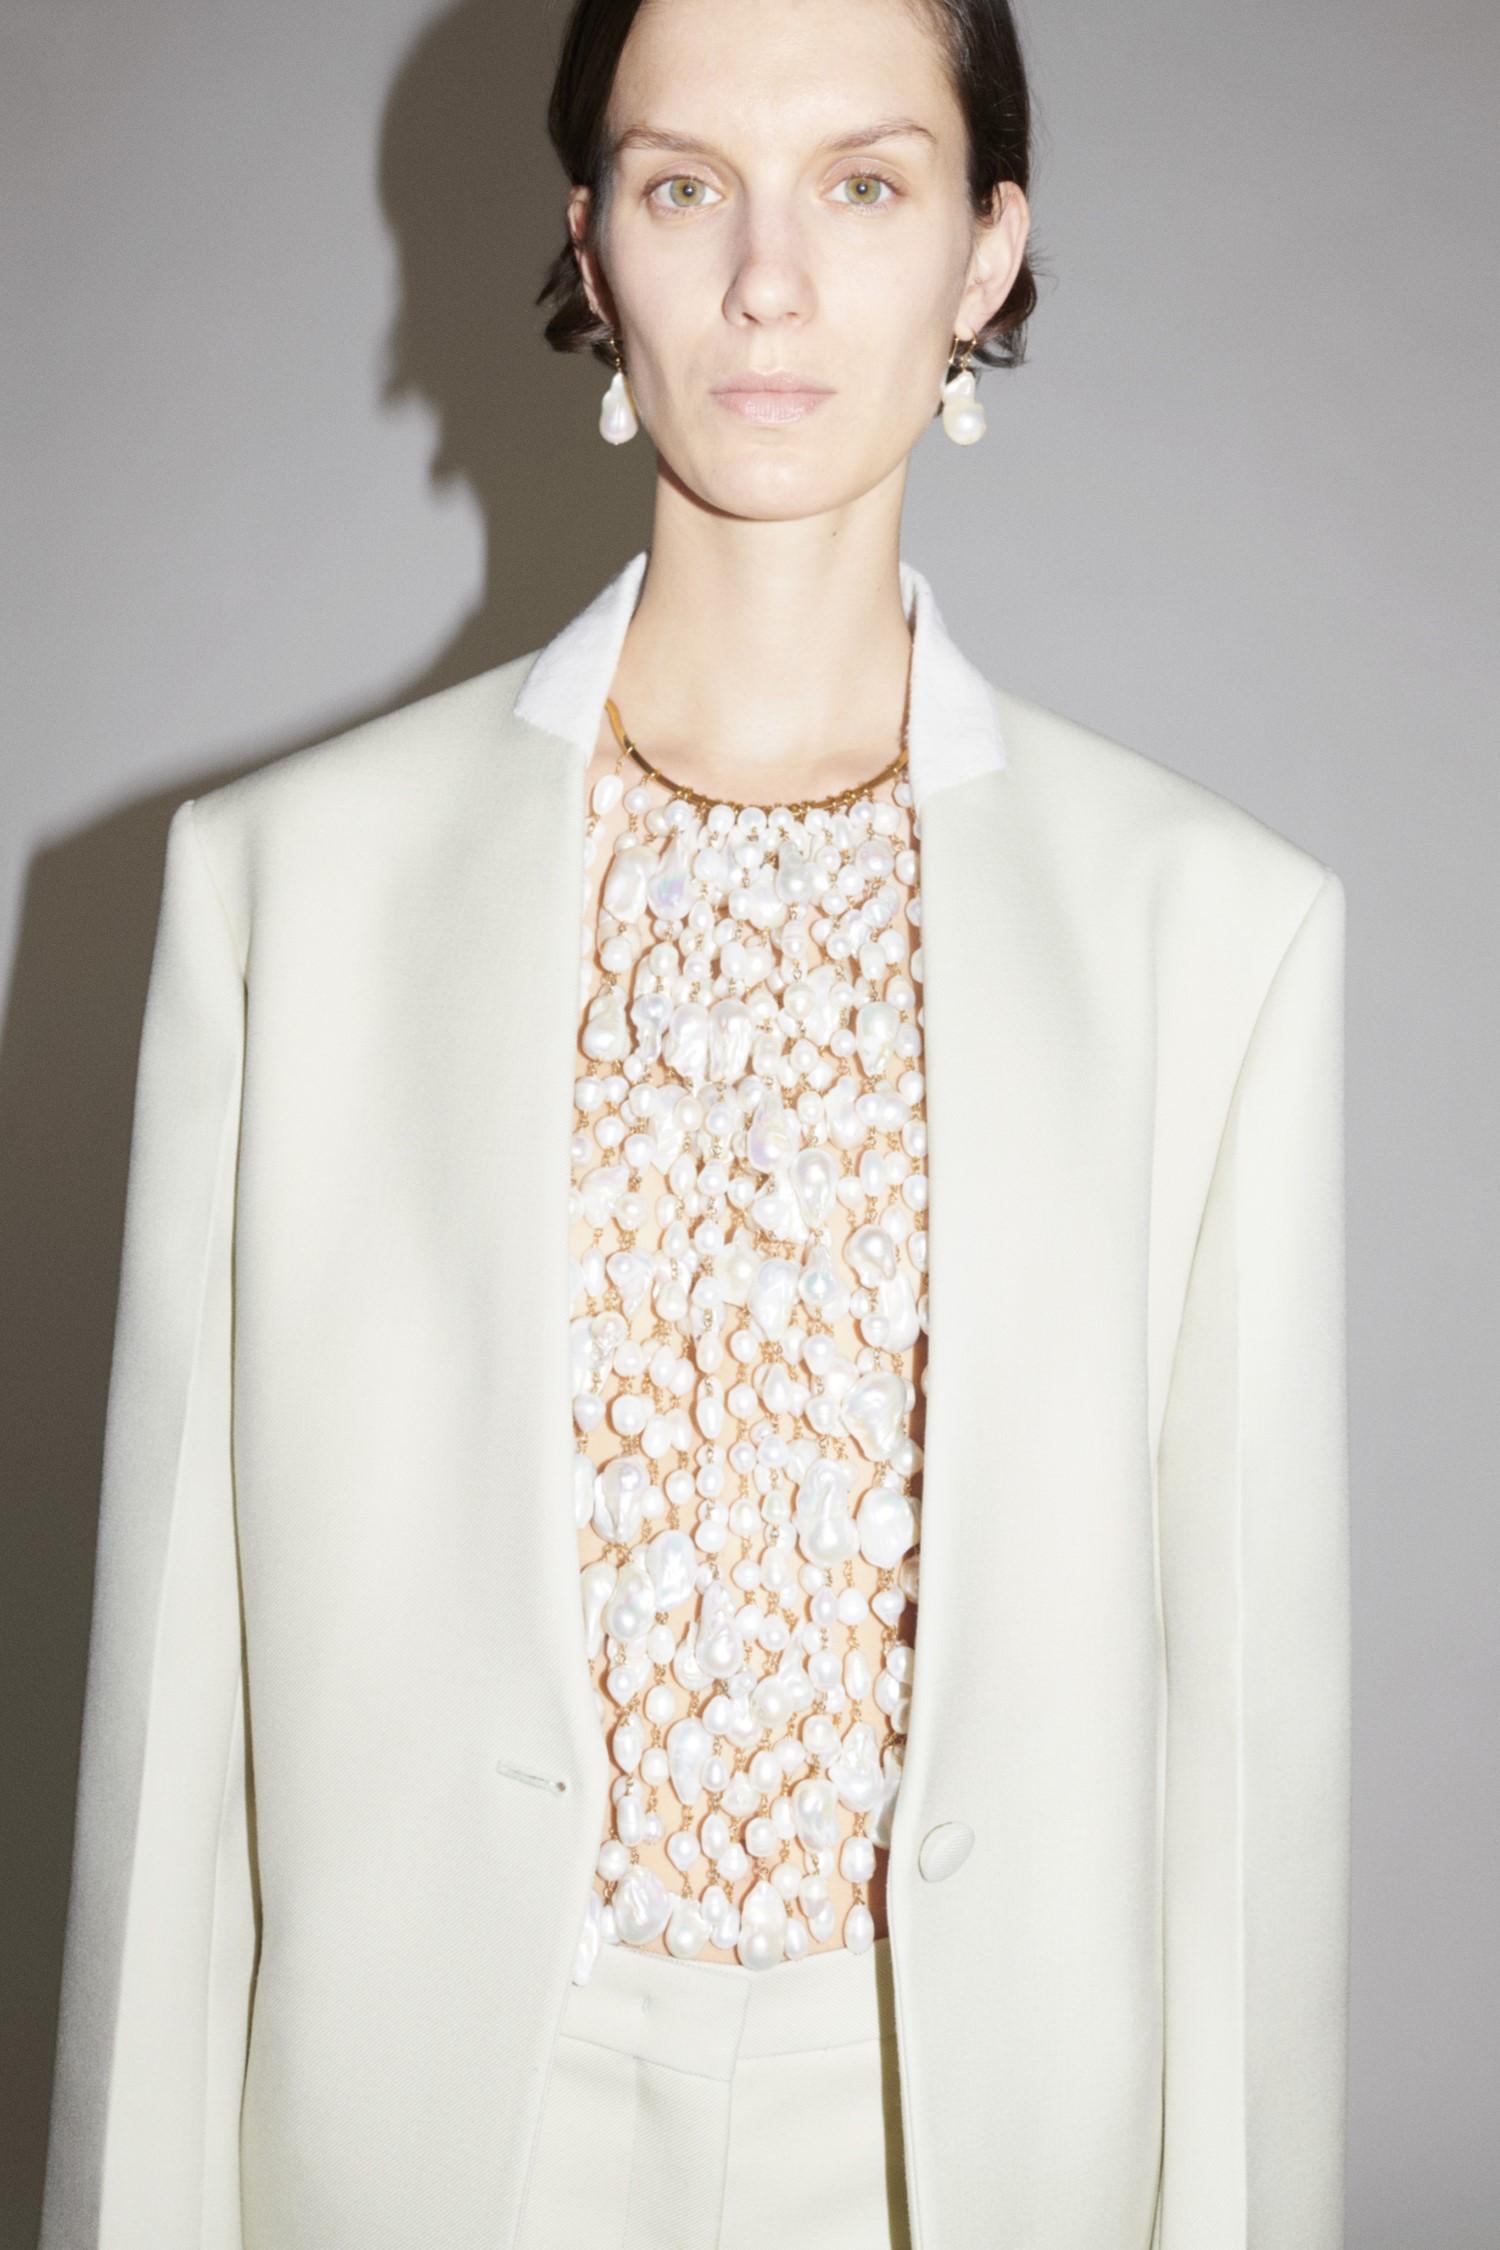 Jil Sander Fall Winter 2021 - Paris Fashion Week